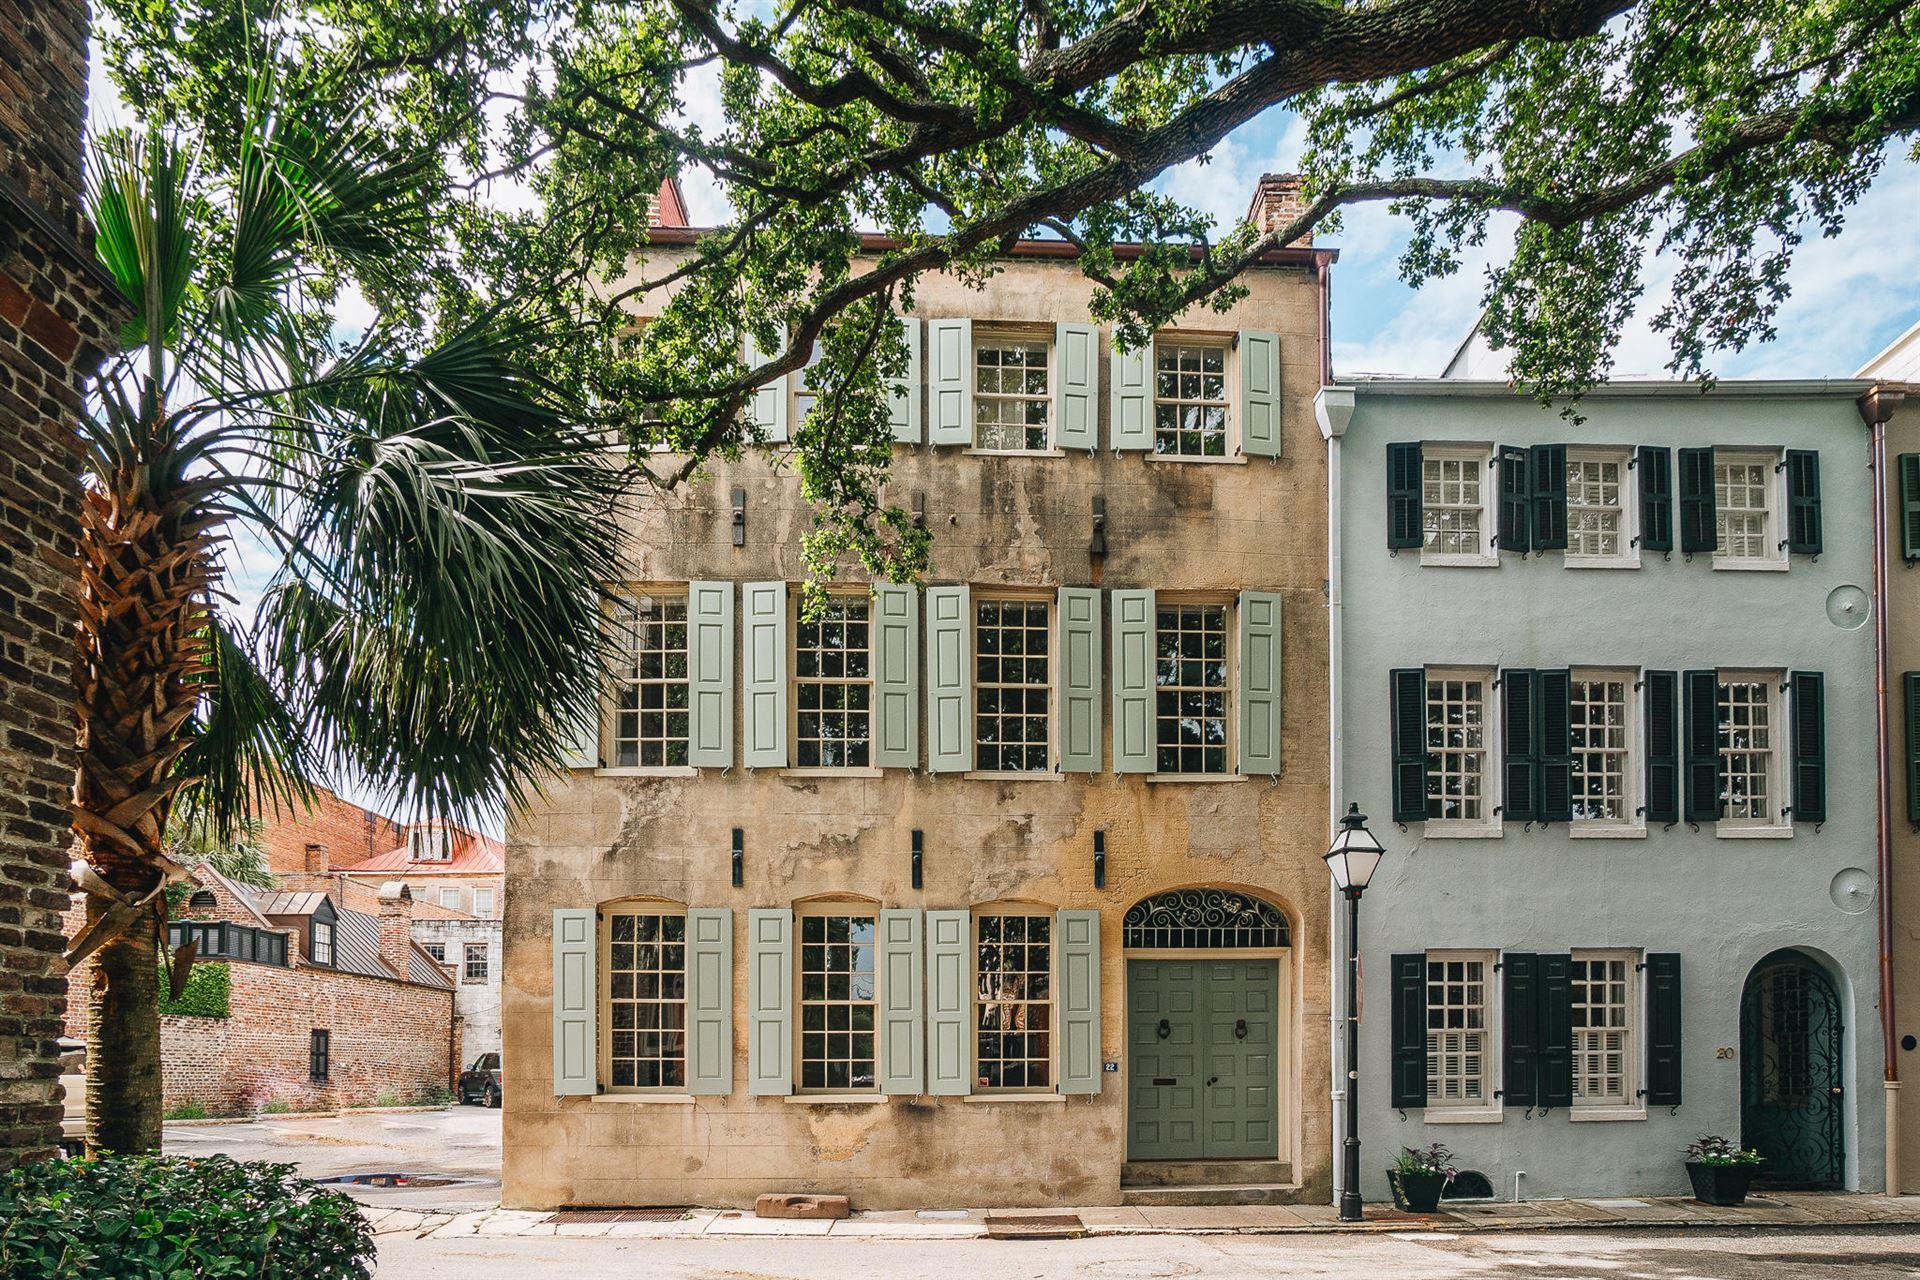 22 Elliott Street, Charleston, SC 29401 - #: 20003425